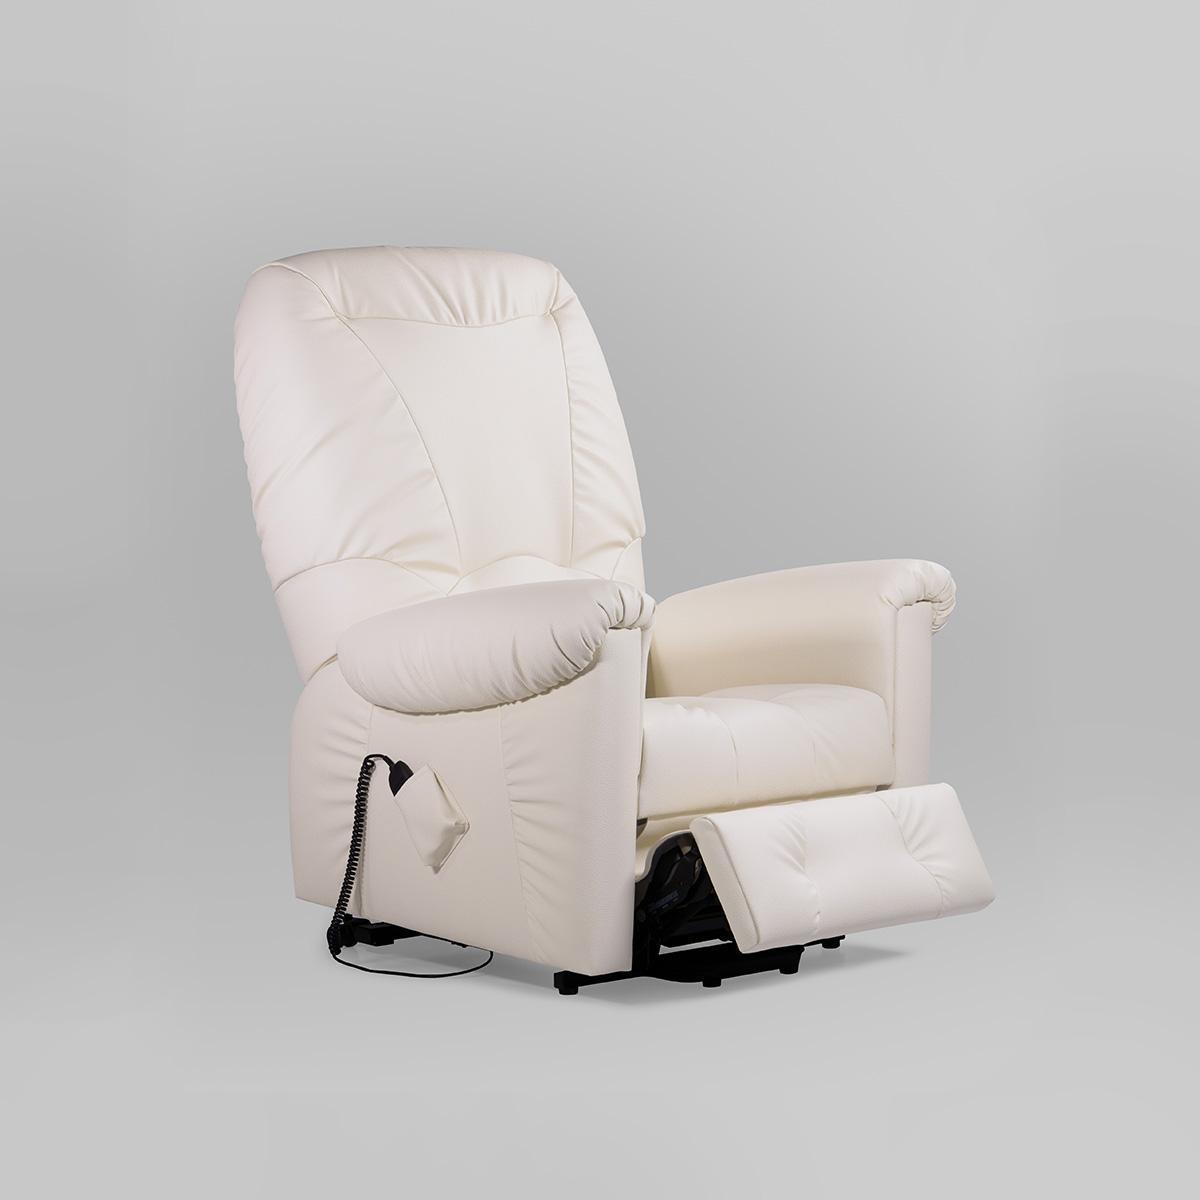 poltrona super comfort Poltrona Super Comfort colunex super comfort poltrona 01